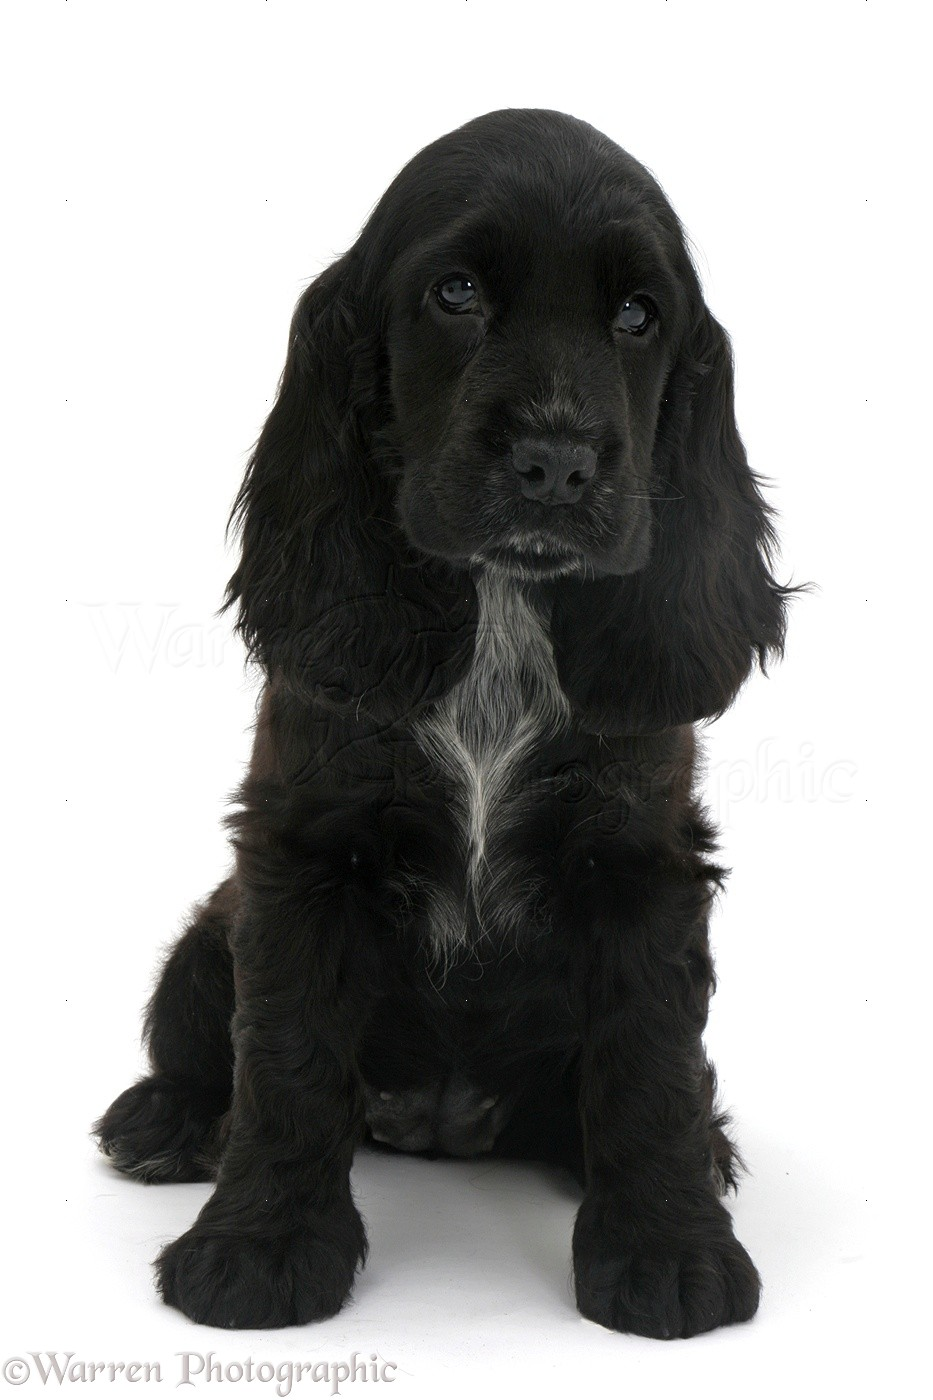 Dog Black Cocker Spaniel Pup Photo Wp47648